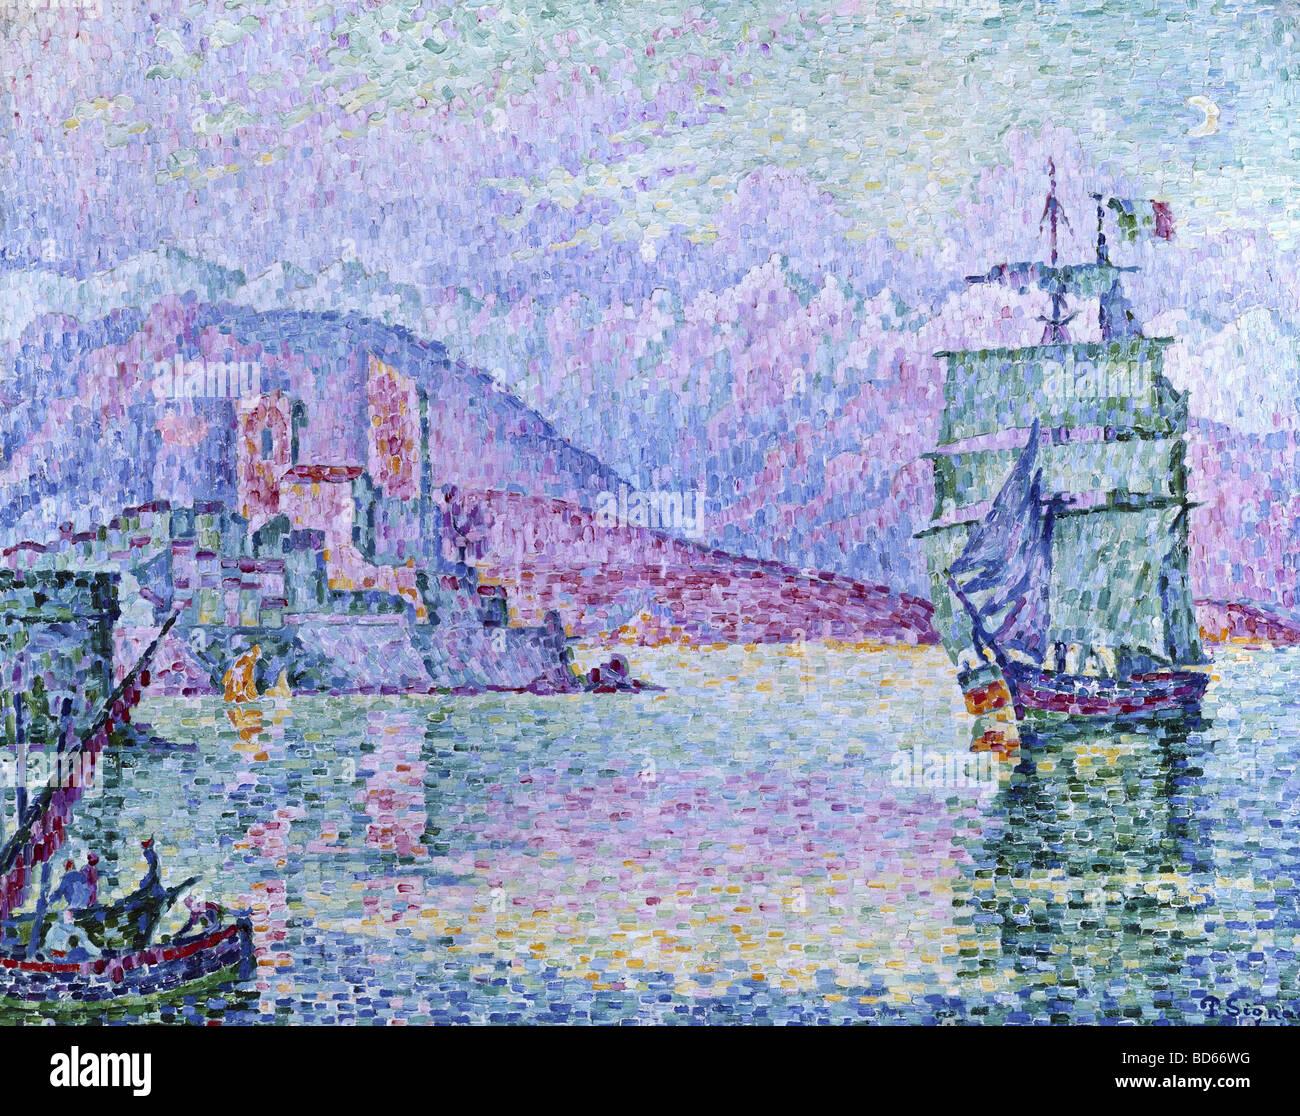 "Belle arti, Signac Paul, (1863 - 1935), pittura, 'Antibes, Sera"", 1914, olio su tela, il Musee de la Ville, Strasburgo, Fra Foto Stock"